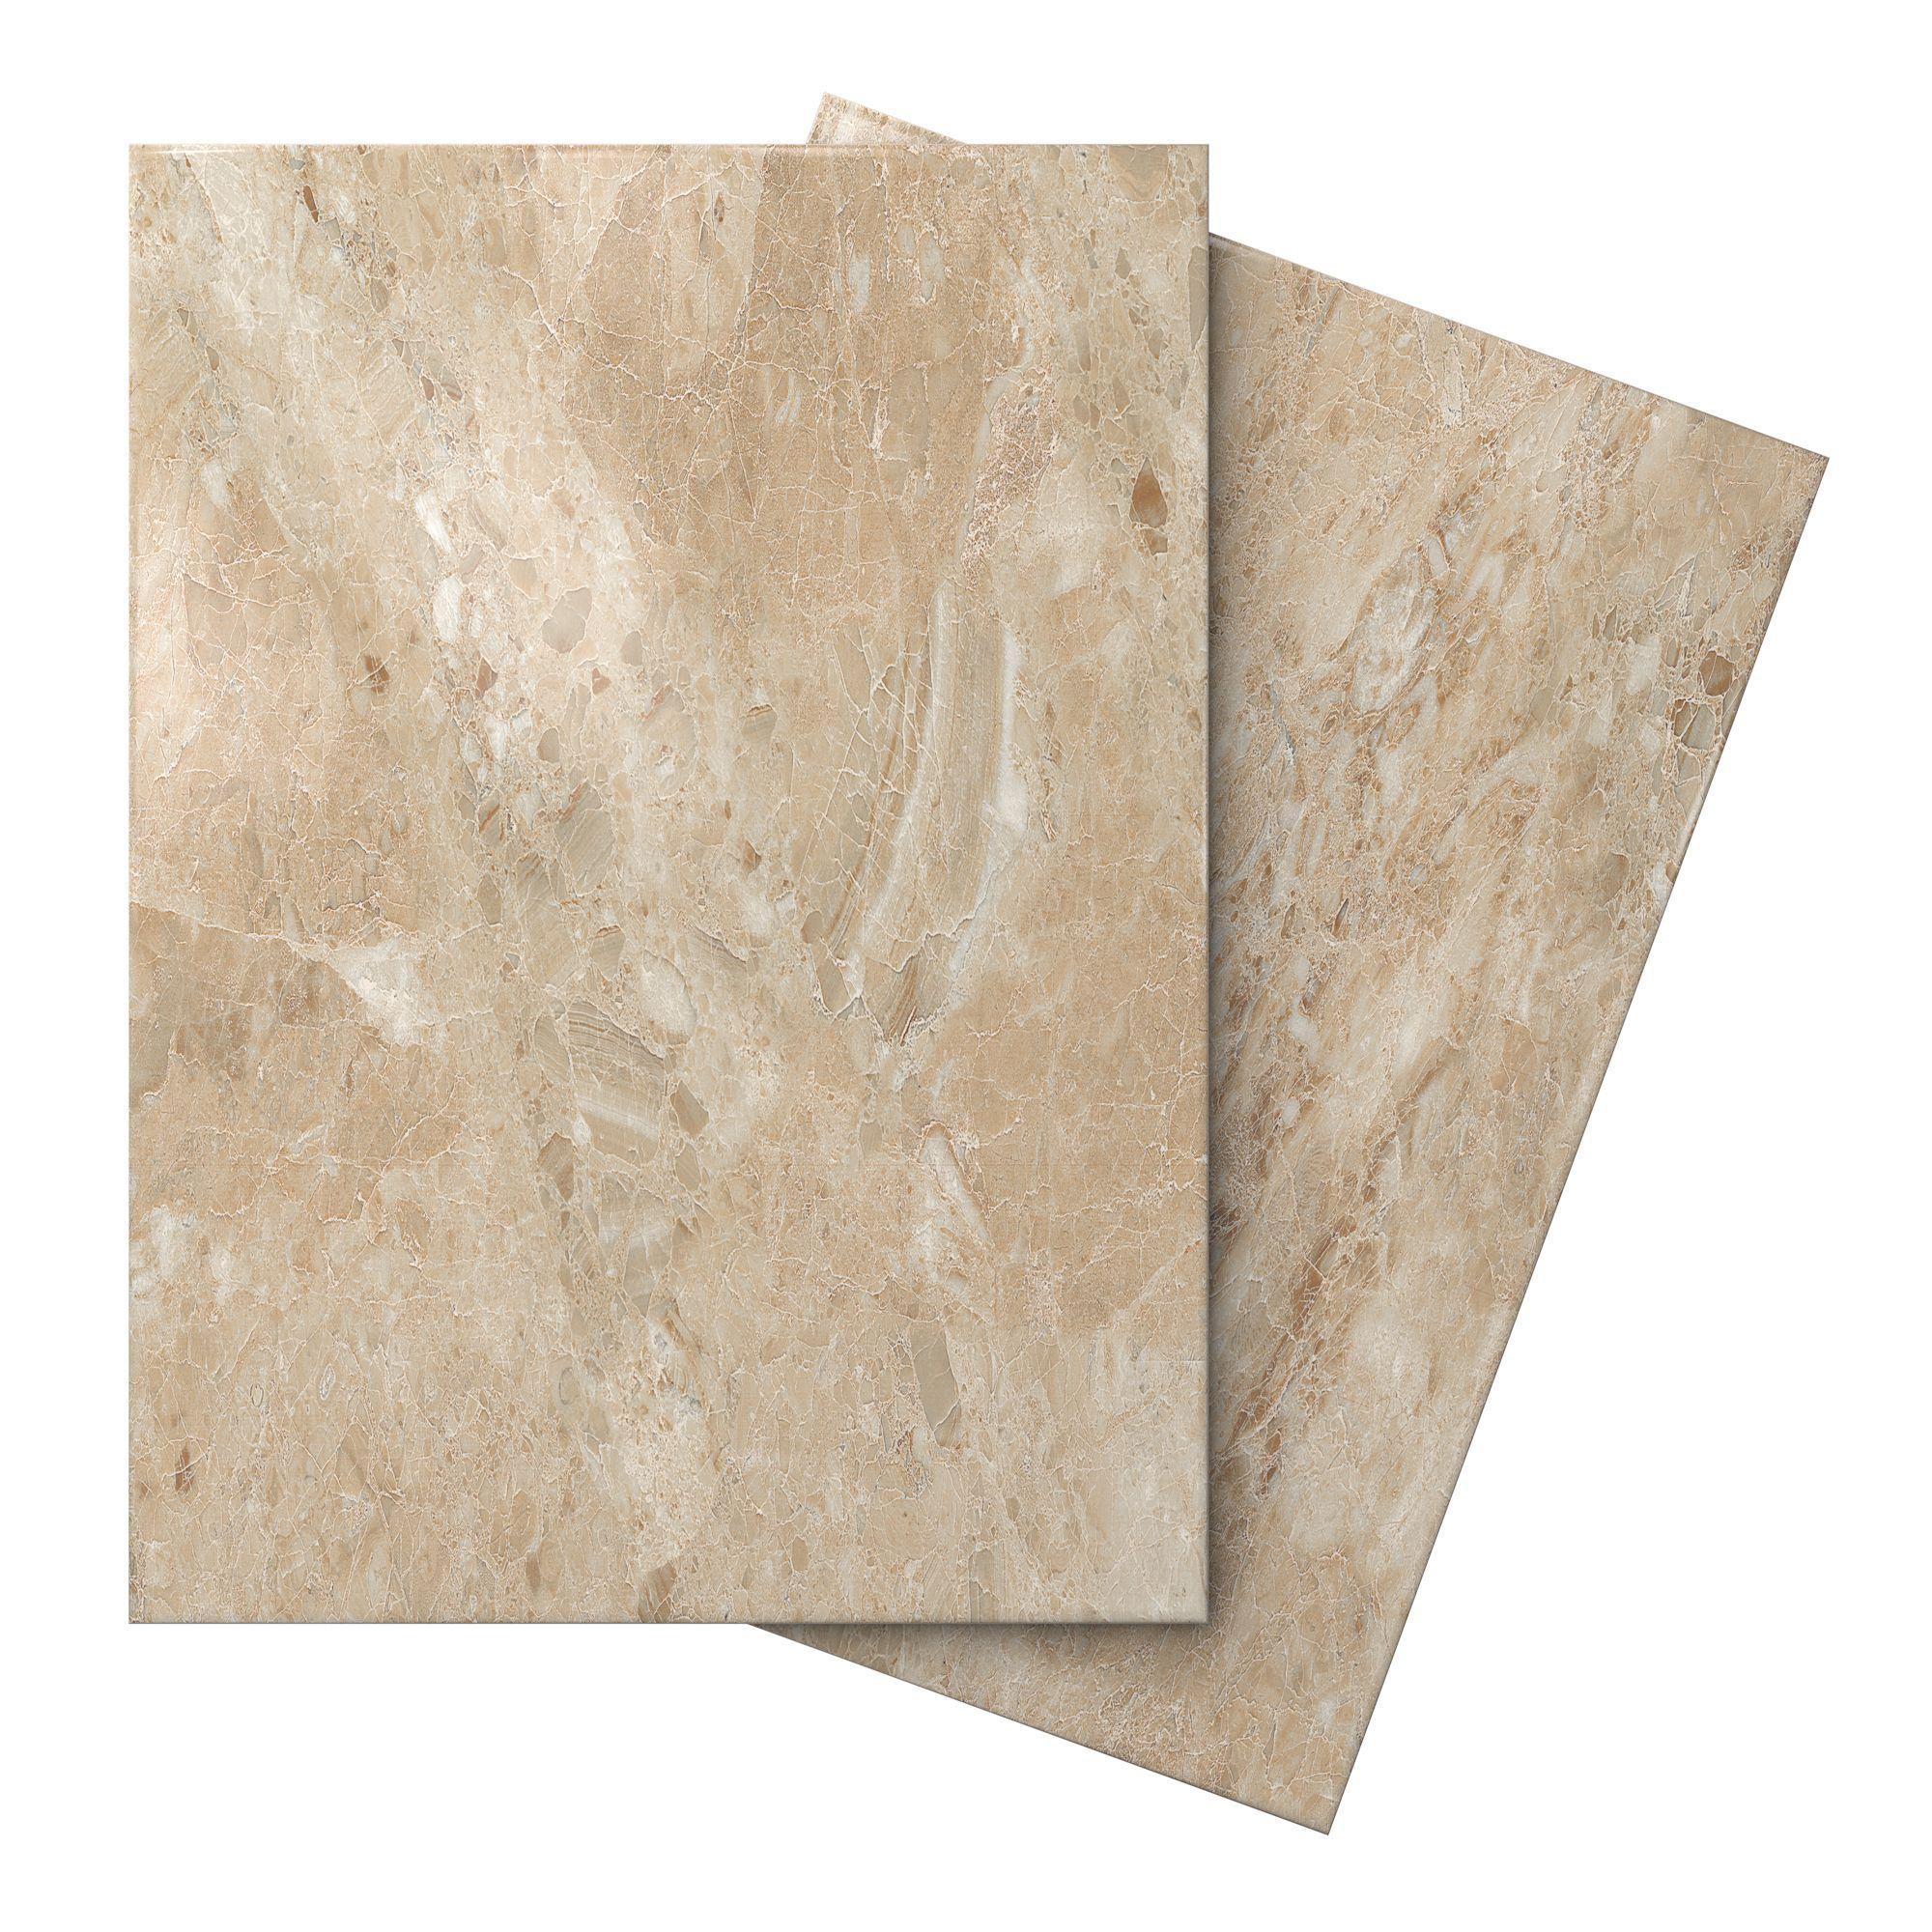 Bq Ceramic Kitchen Floor Tiles Illusion Mocha Marble Effect Ceramic Wall Floor Tile Pack Of 10